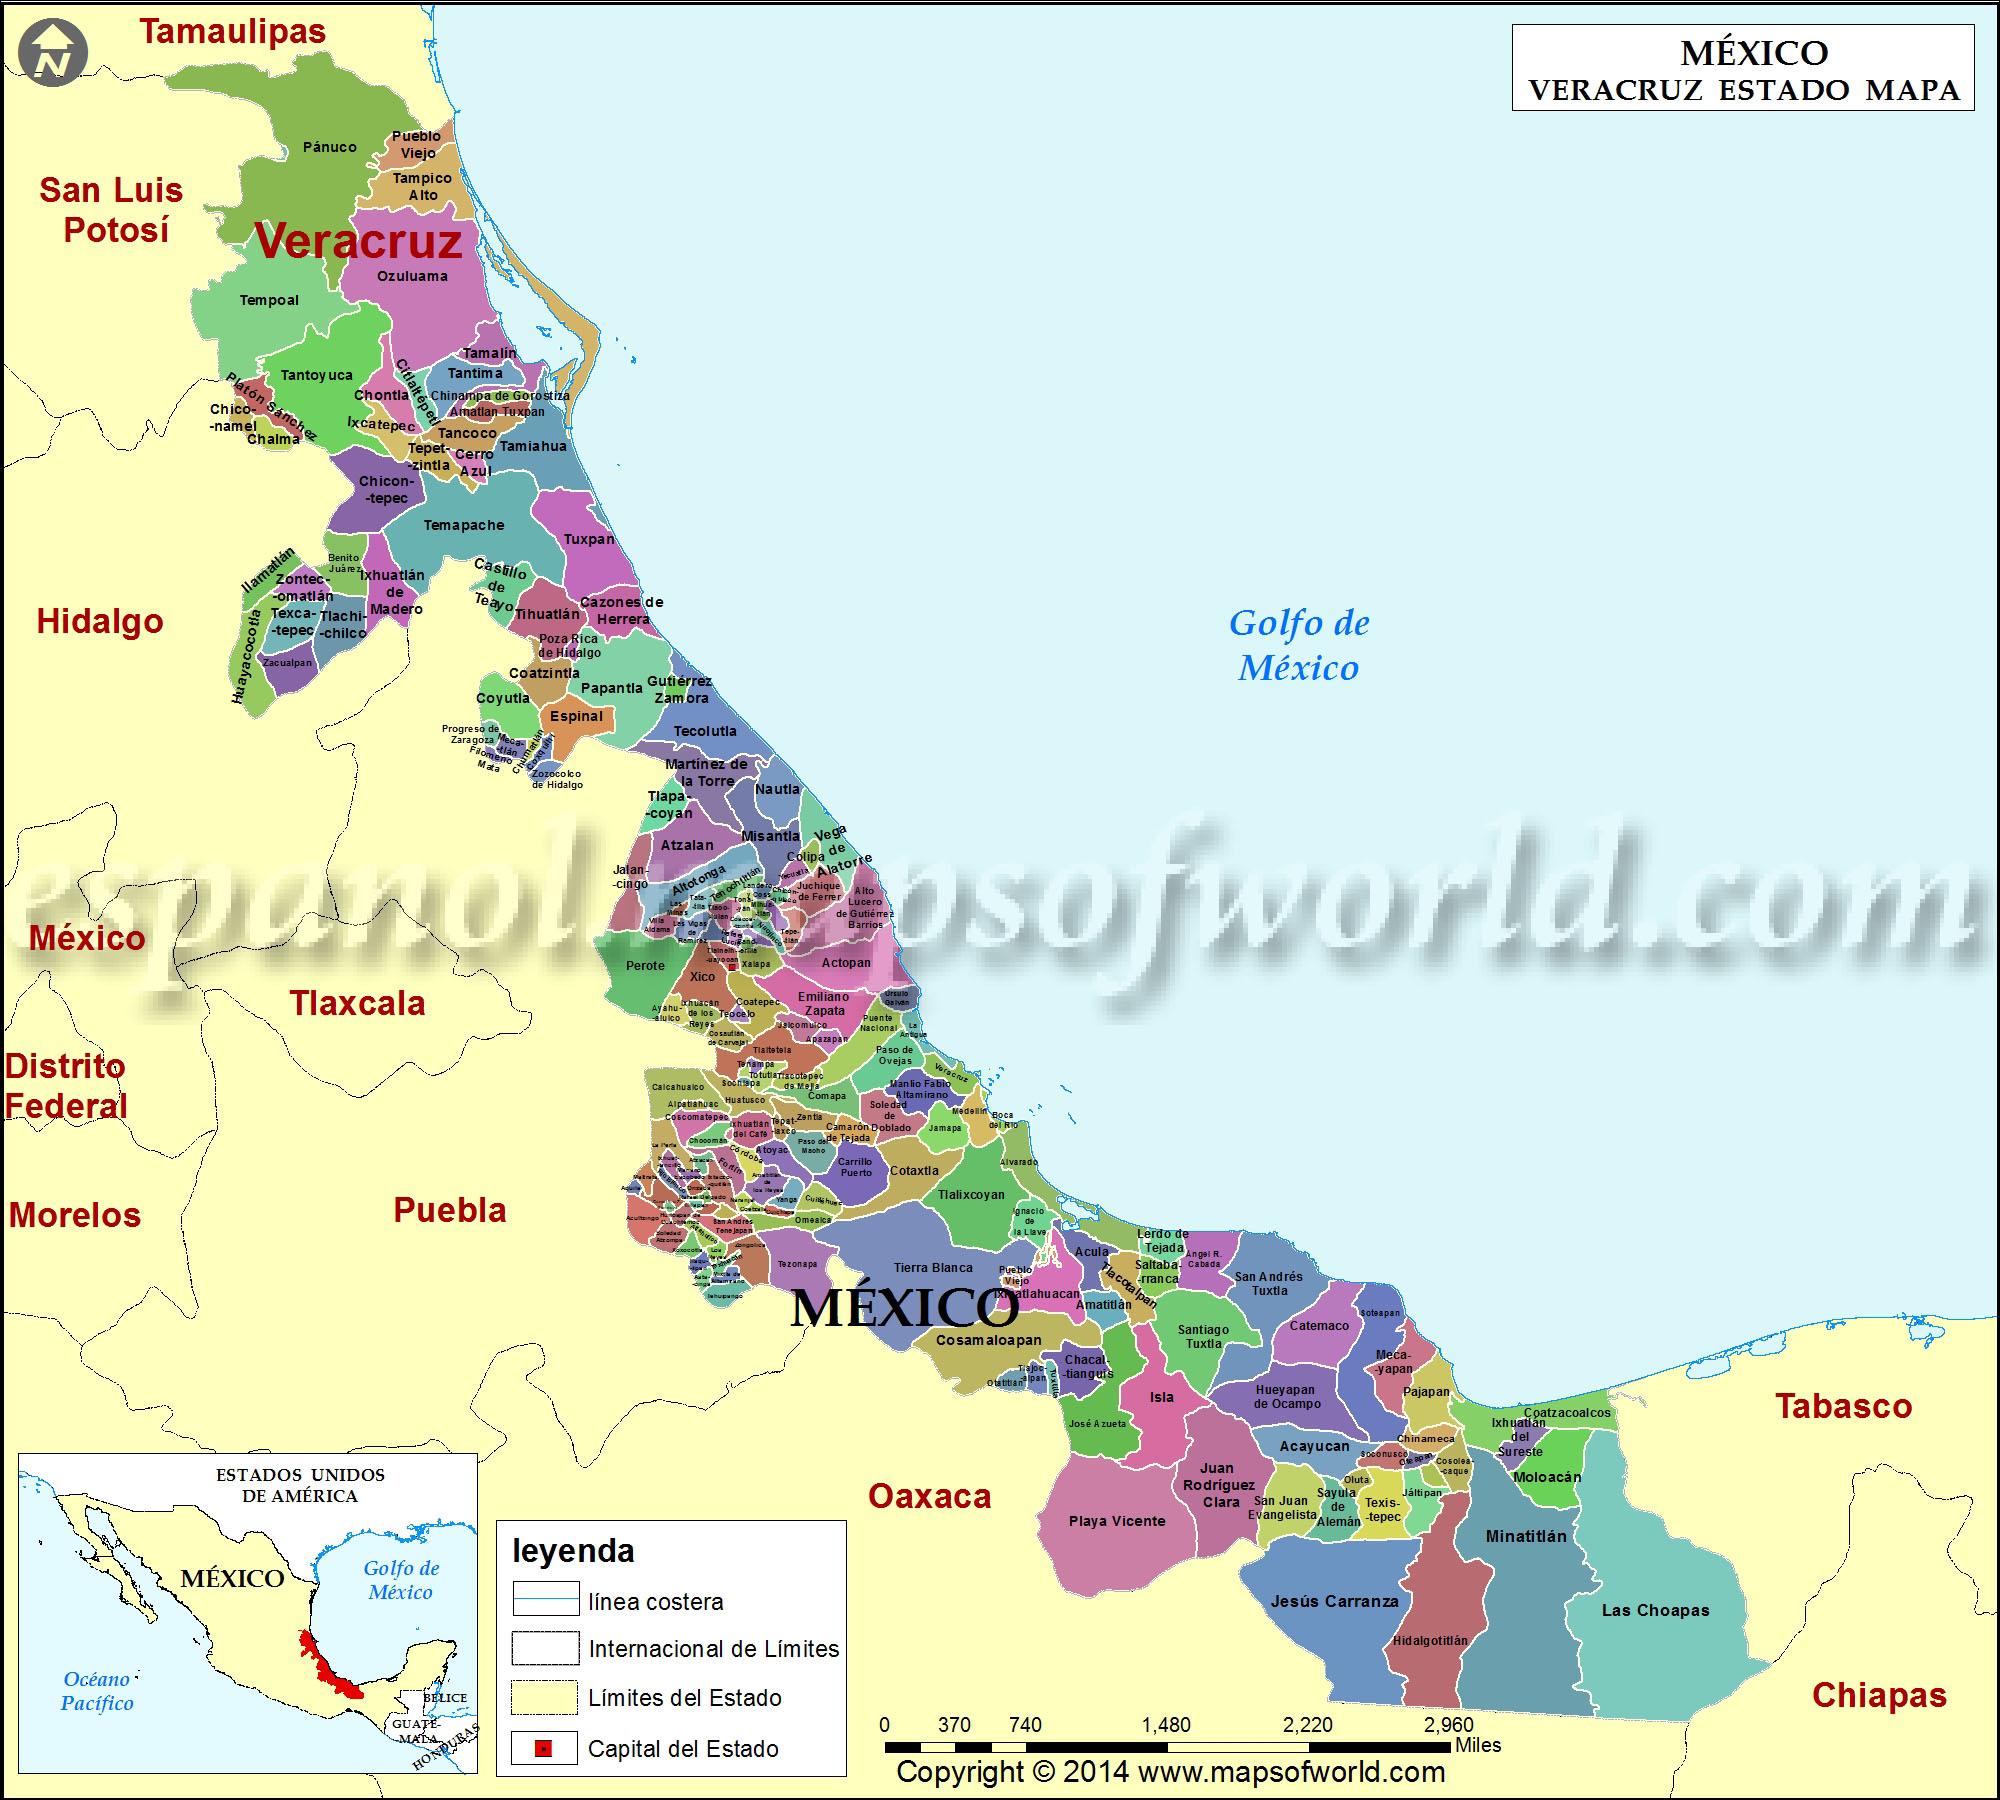 Mapa de Veracruz  Estado de Veracruz Mexico